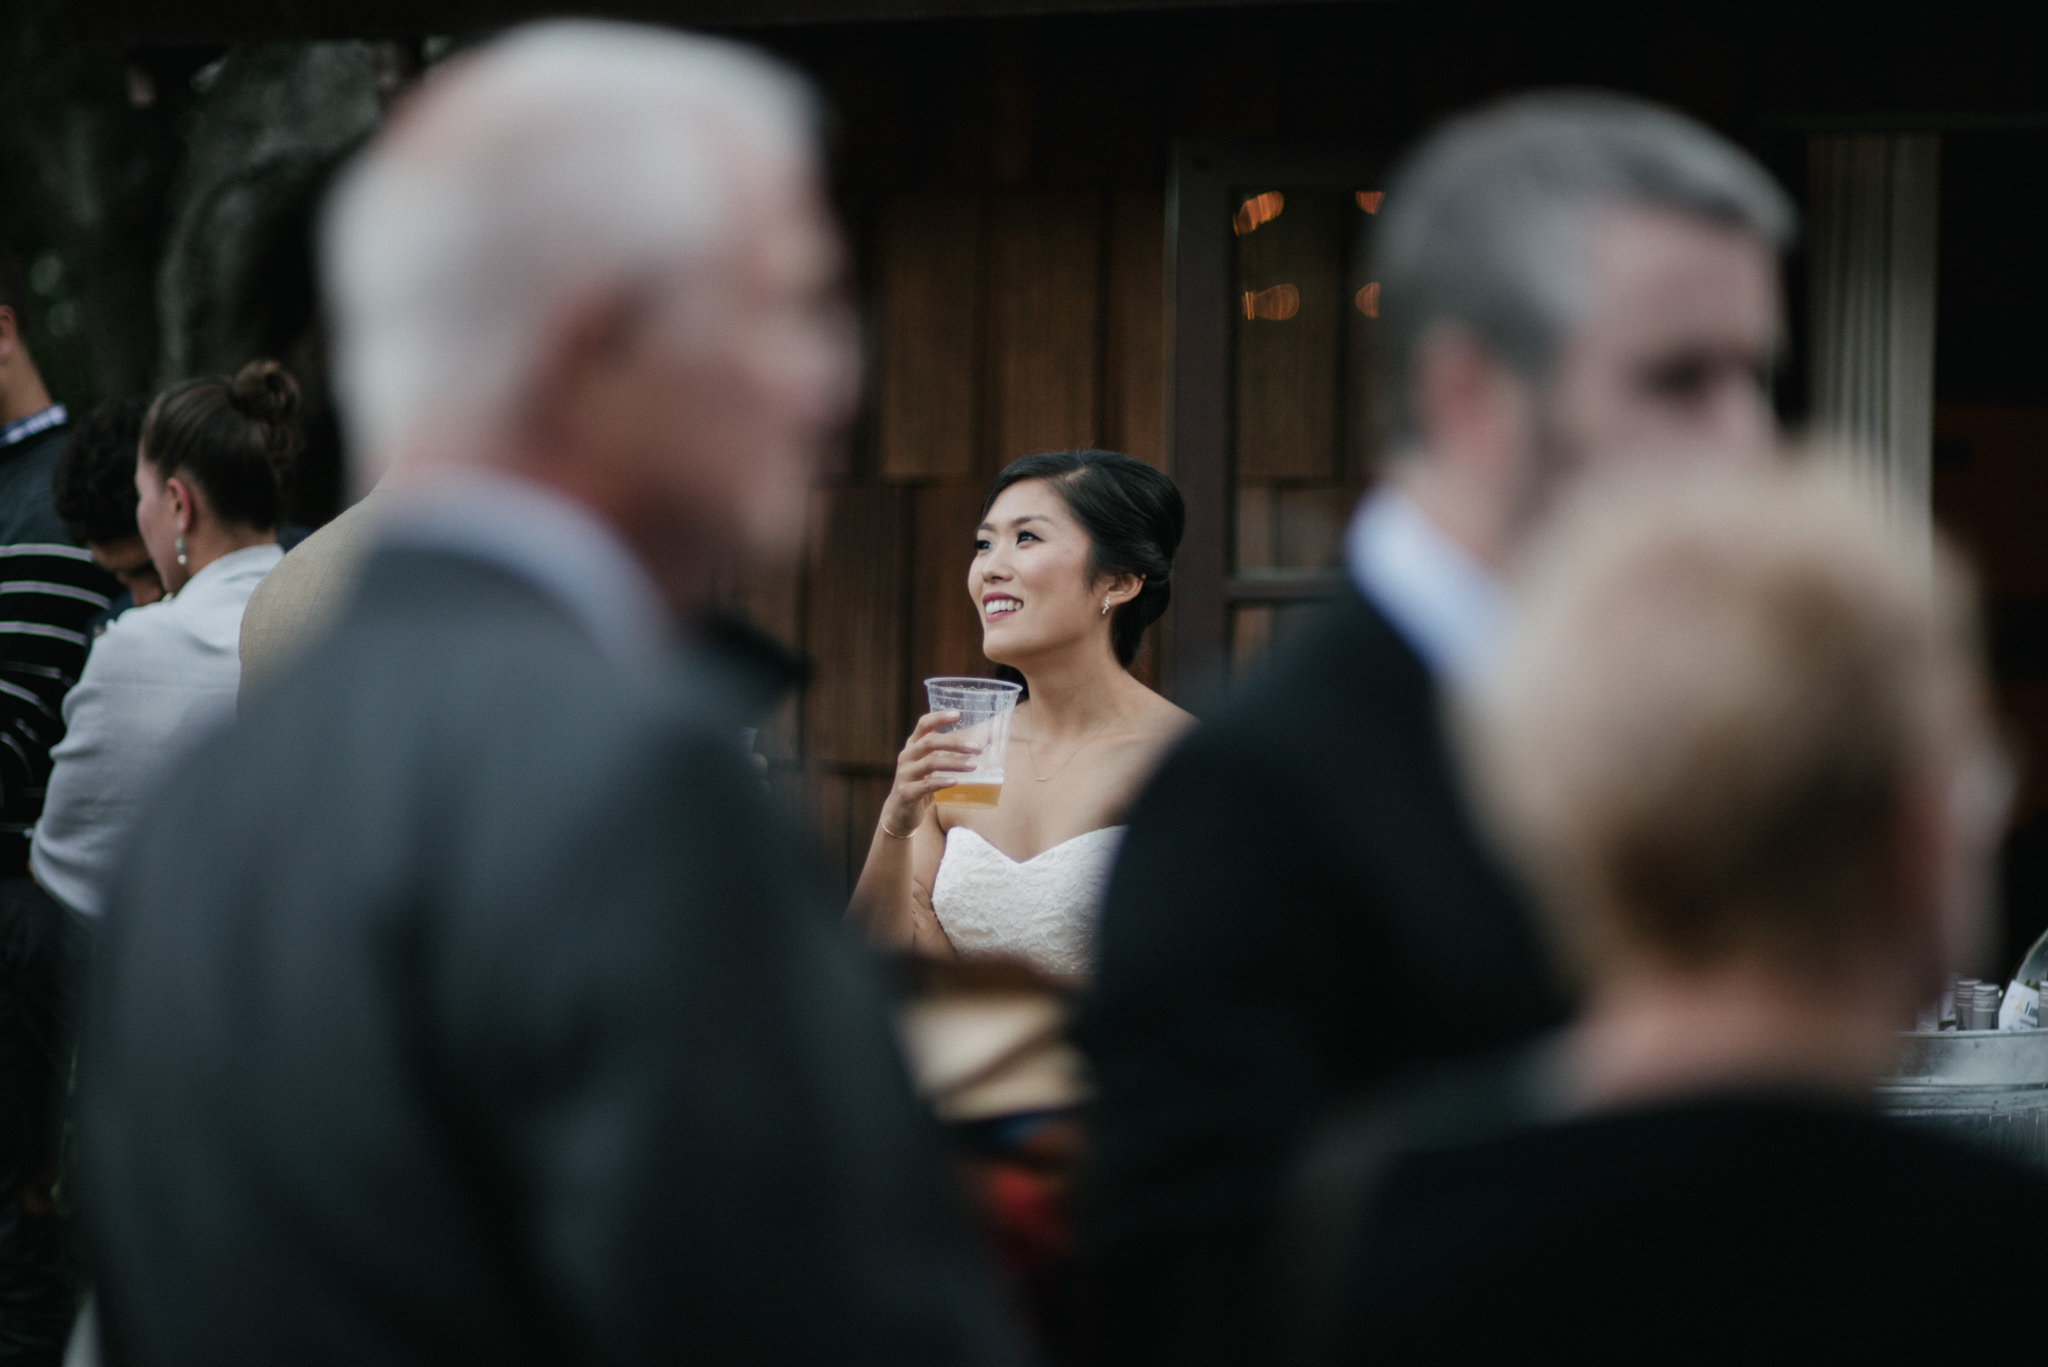 Daring Wanderer Photography - Daring Wanderer - Destination Wedding Photographer - Mill valley wedding photographer - Old Mill Park Wedding - Redwoods wedding - forest wedding ceremony - california wedding photographer - the outdoor arts club wedding